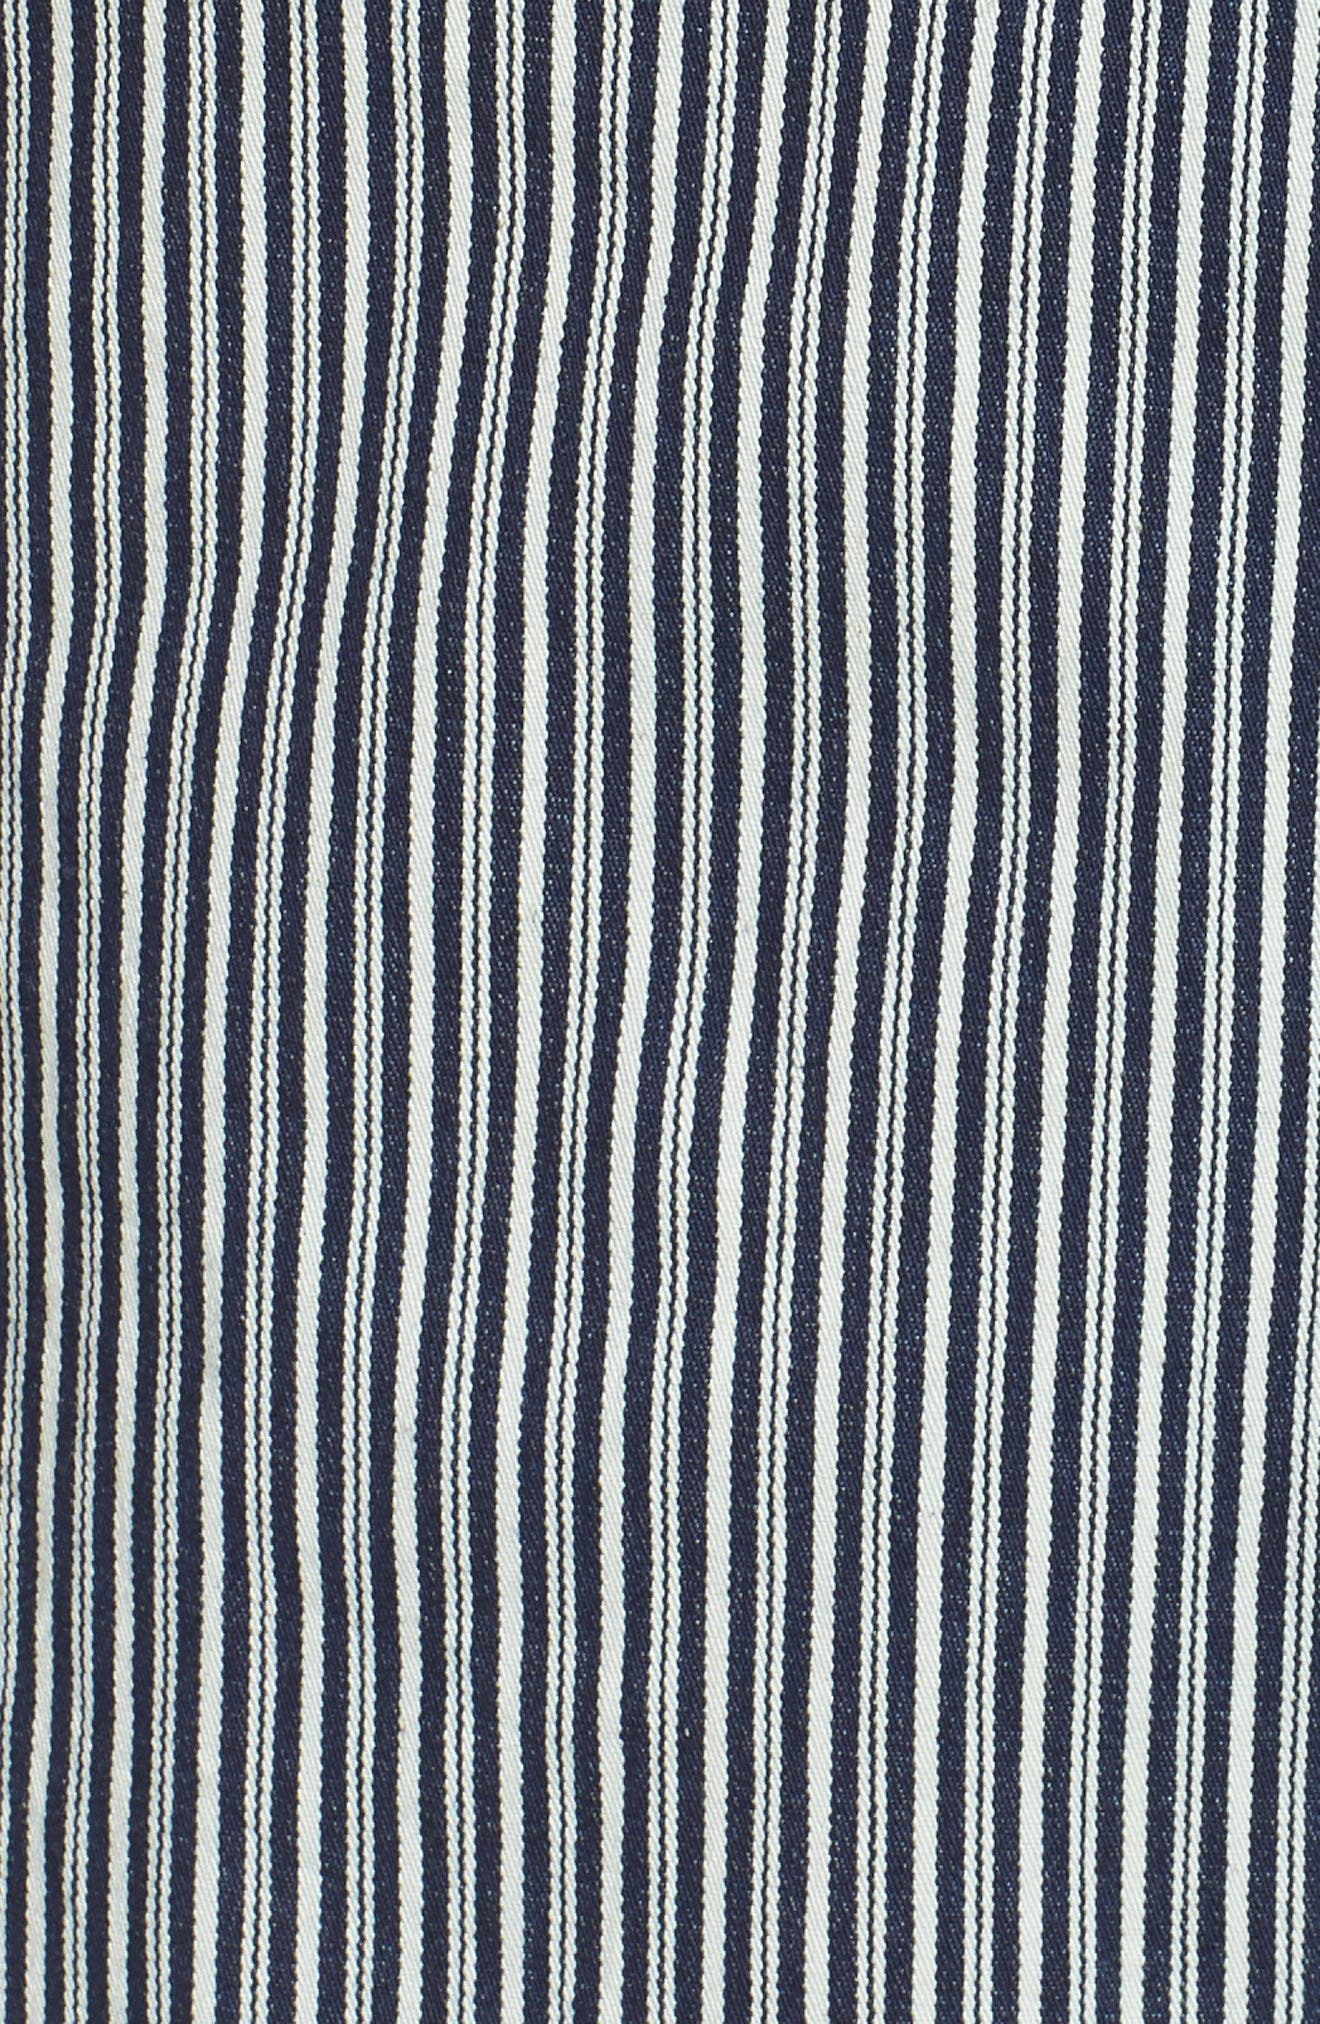 Santa Rose Stripe Sundress,                             Alternate thumbnail 6, color,                             457